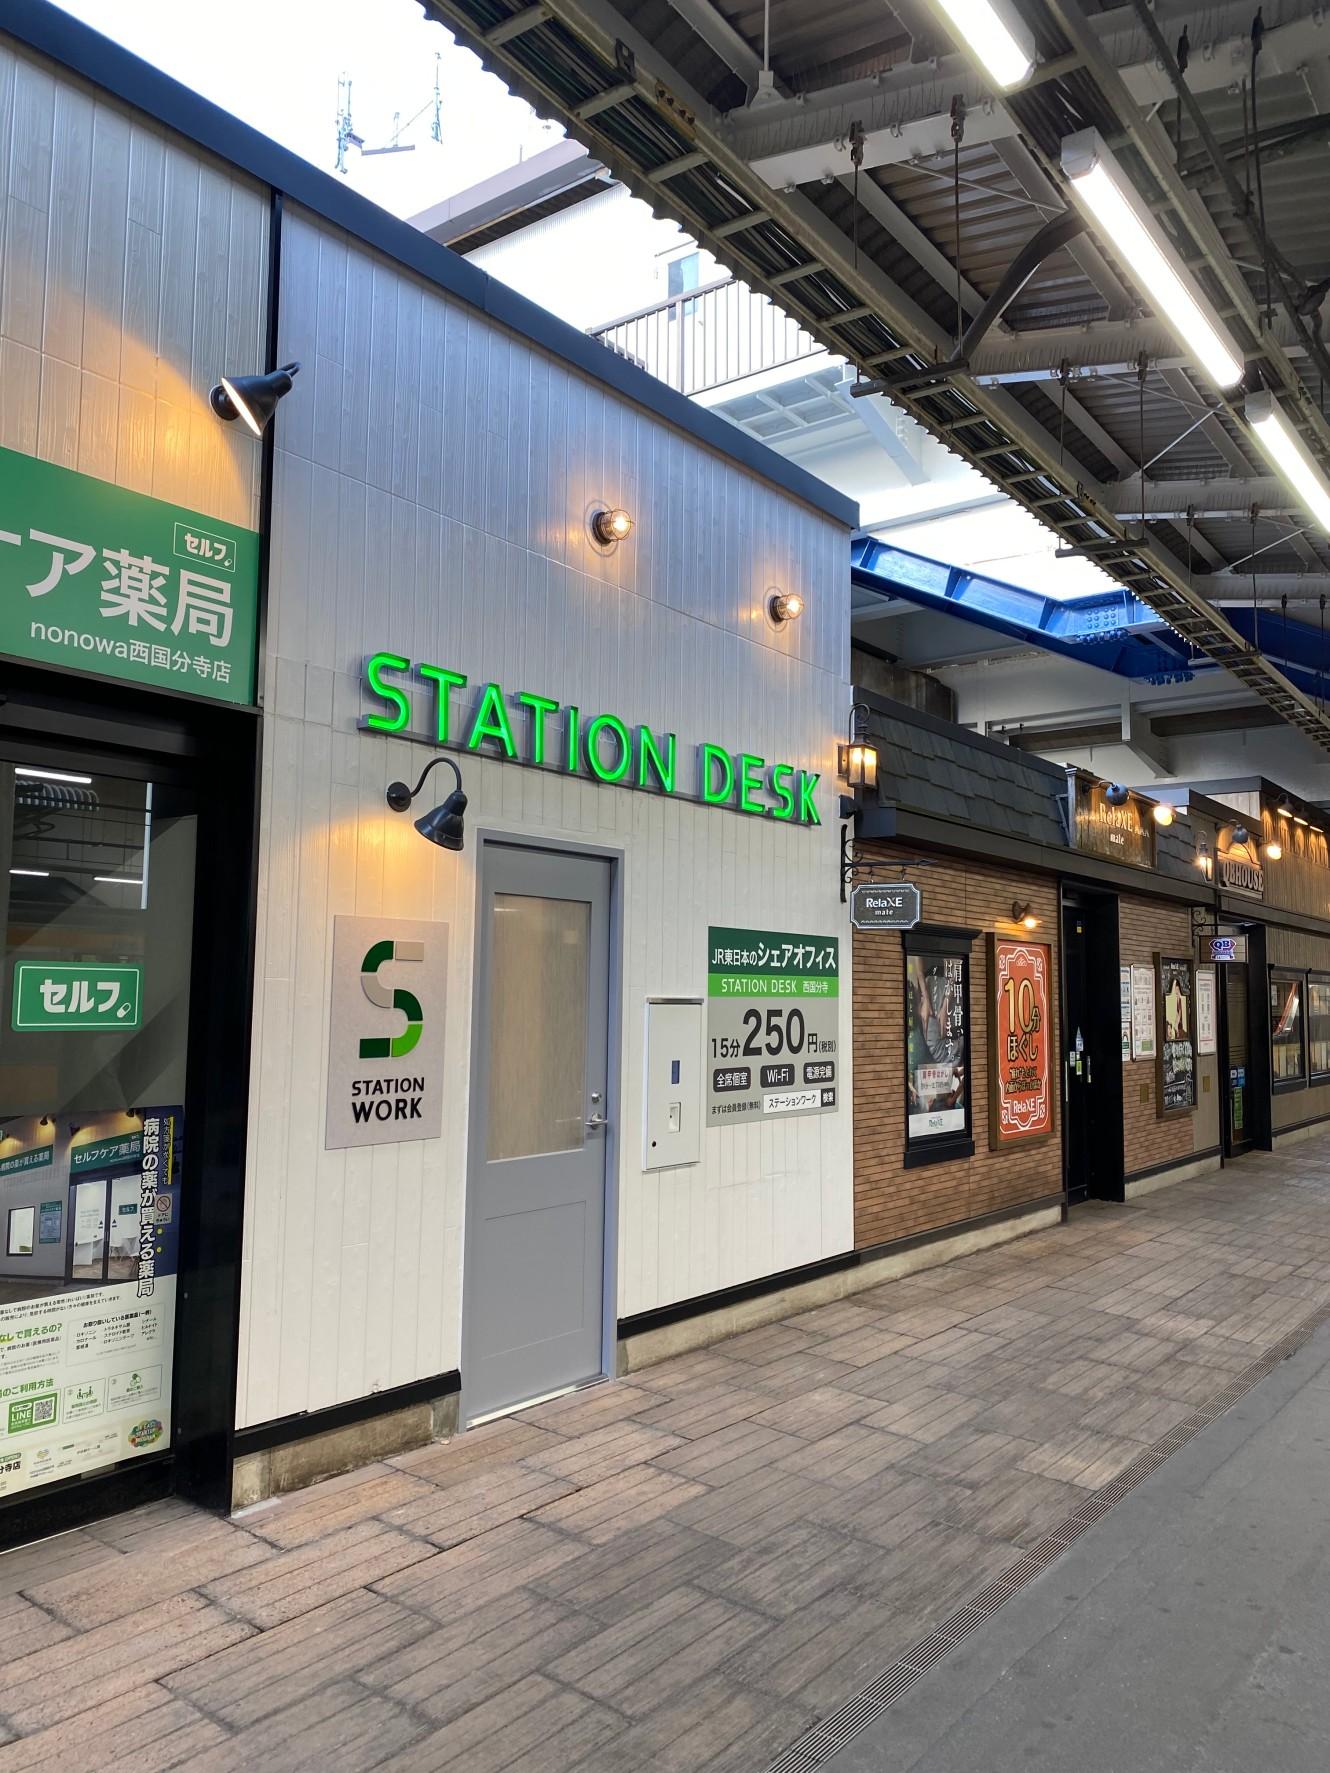 西国分寺駅STATION DESK西国分寺